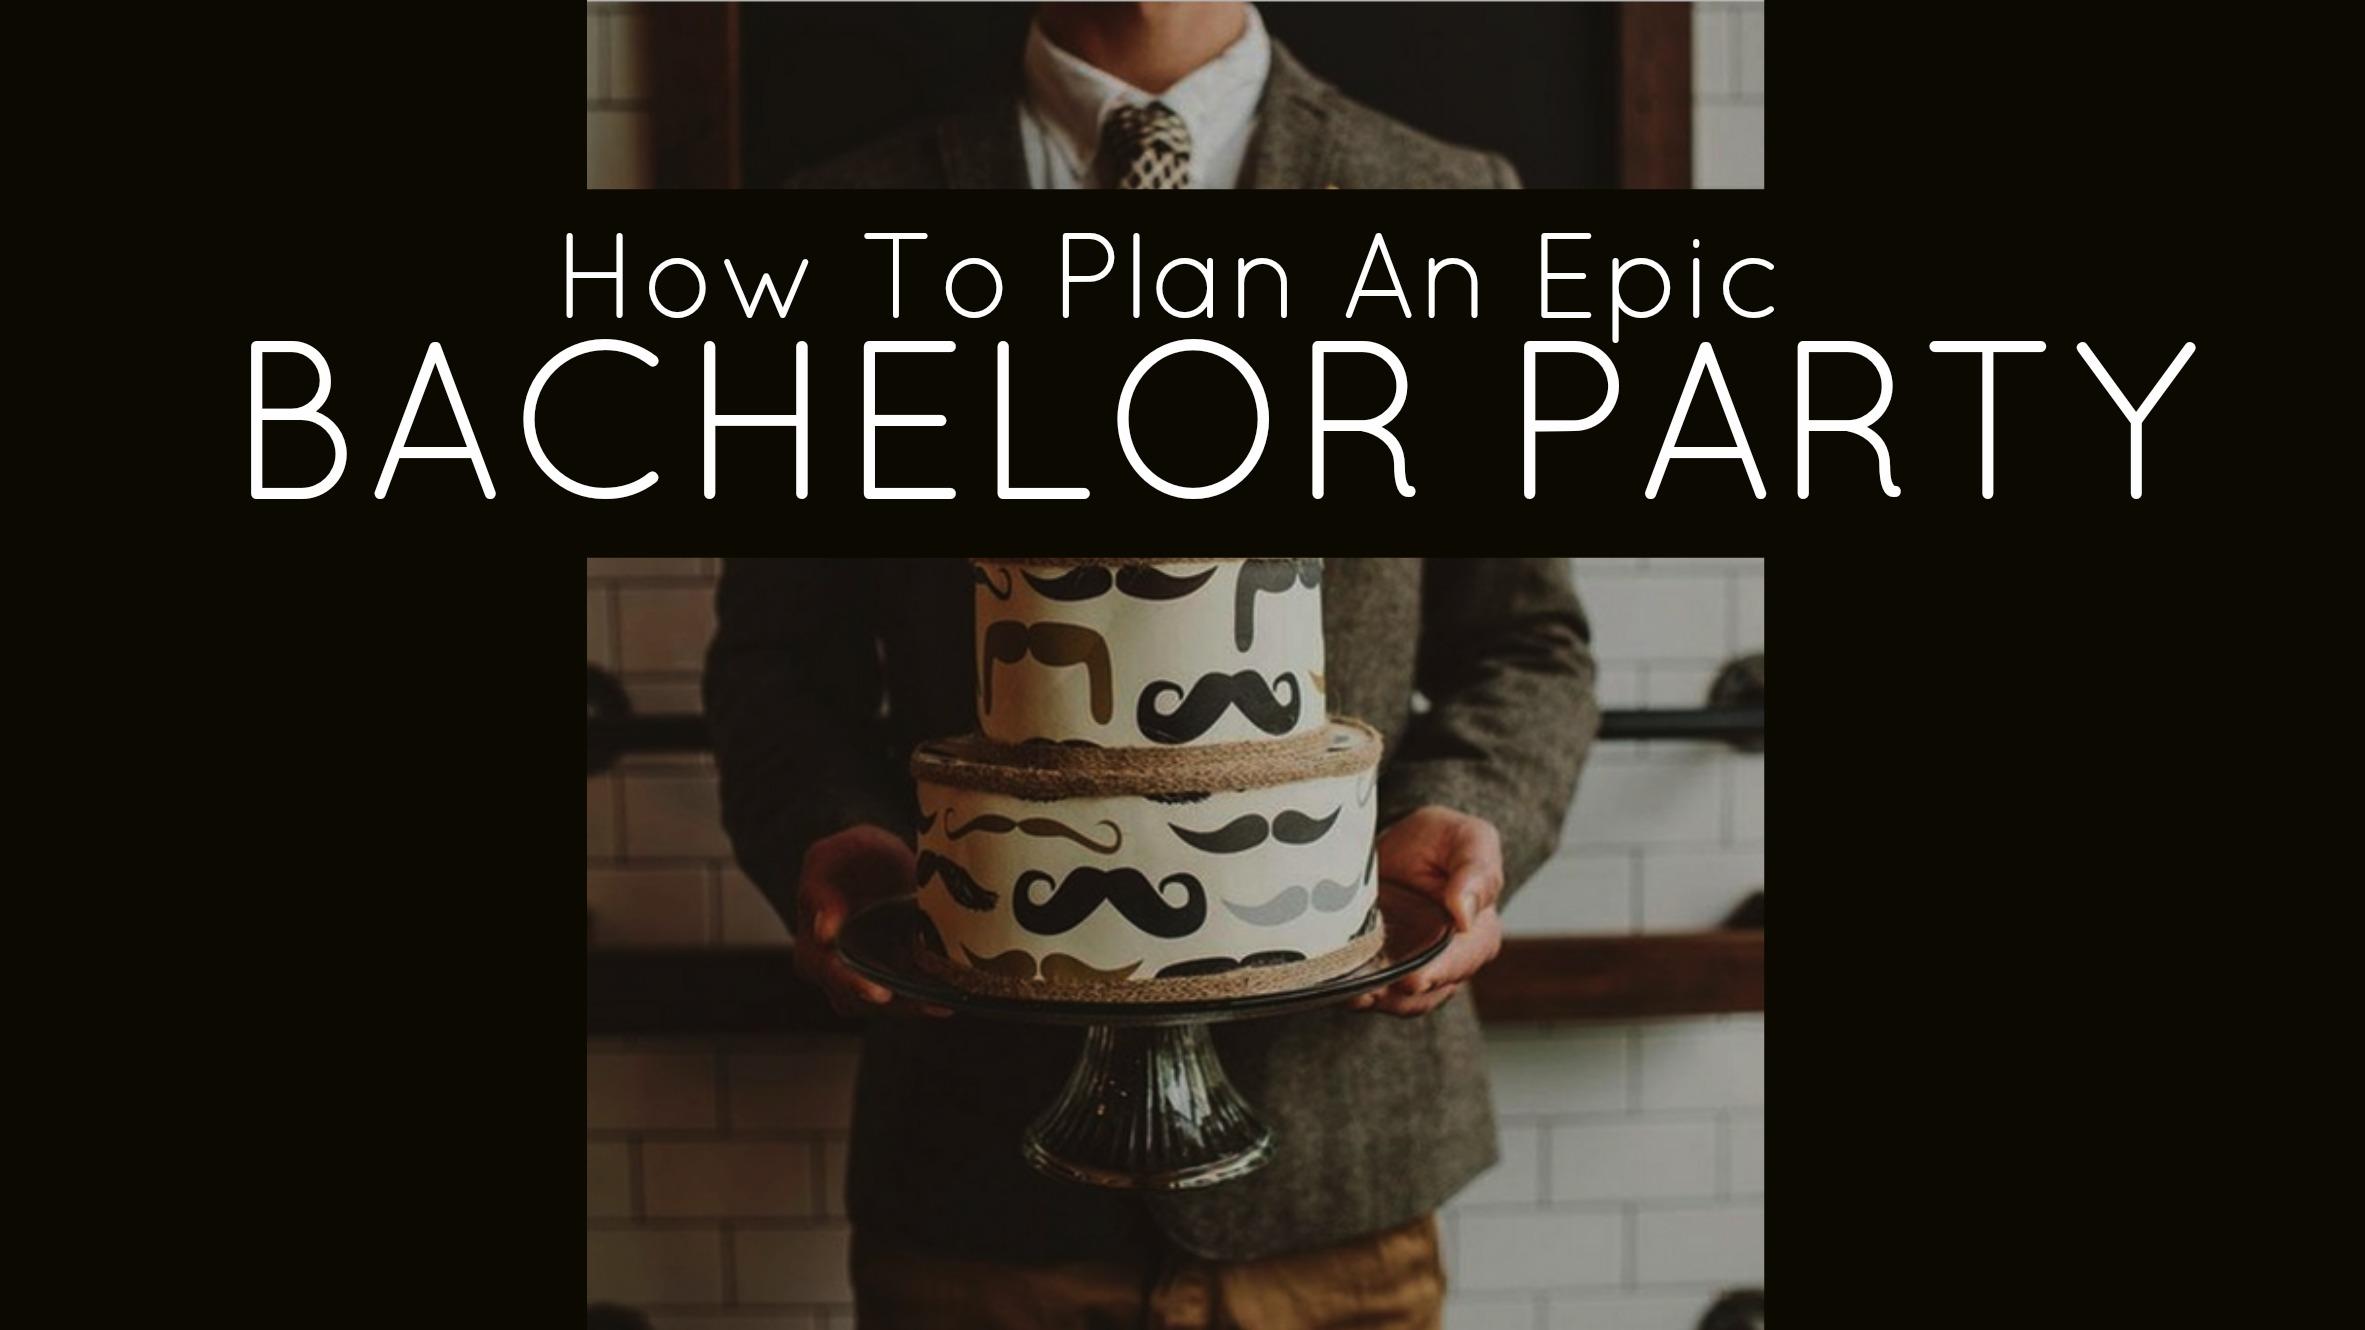 How to plan an Epic Bachelor Party - Bachelor Party Ideas, Awesome Bachelor Party Ideas, Bachelor Party Prank,